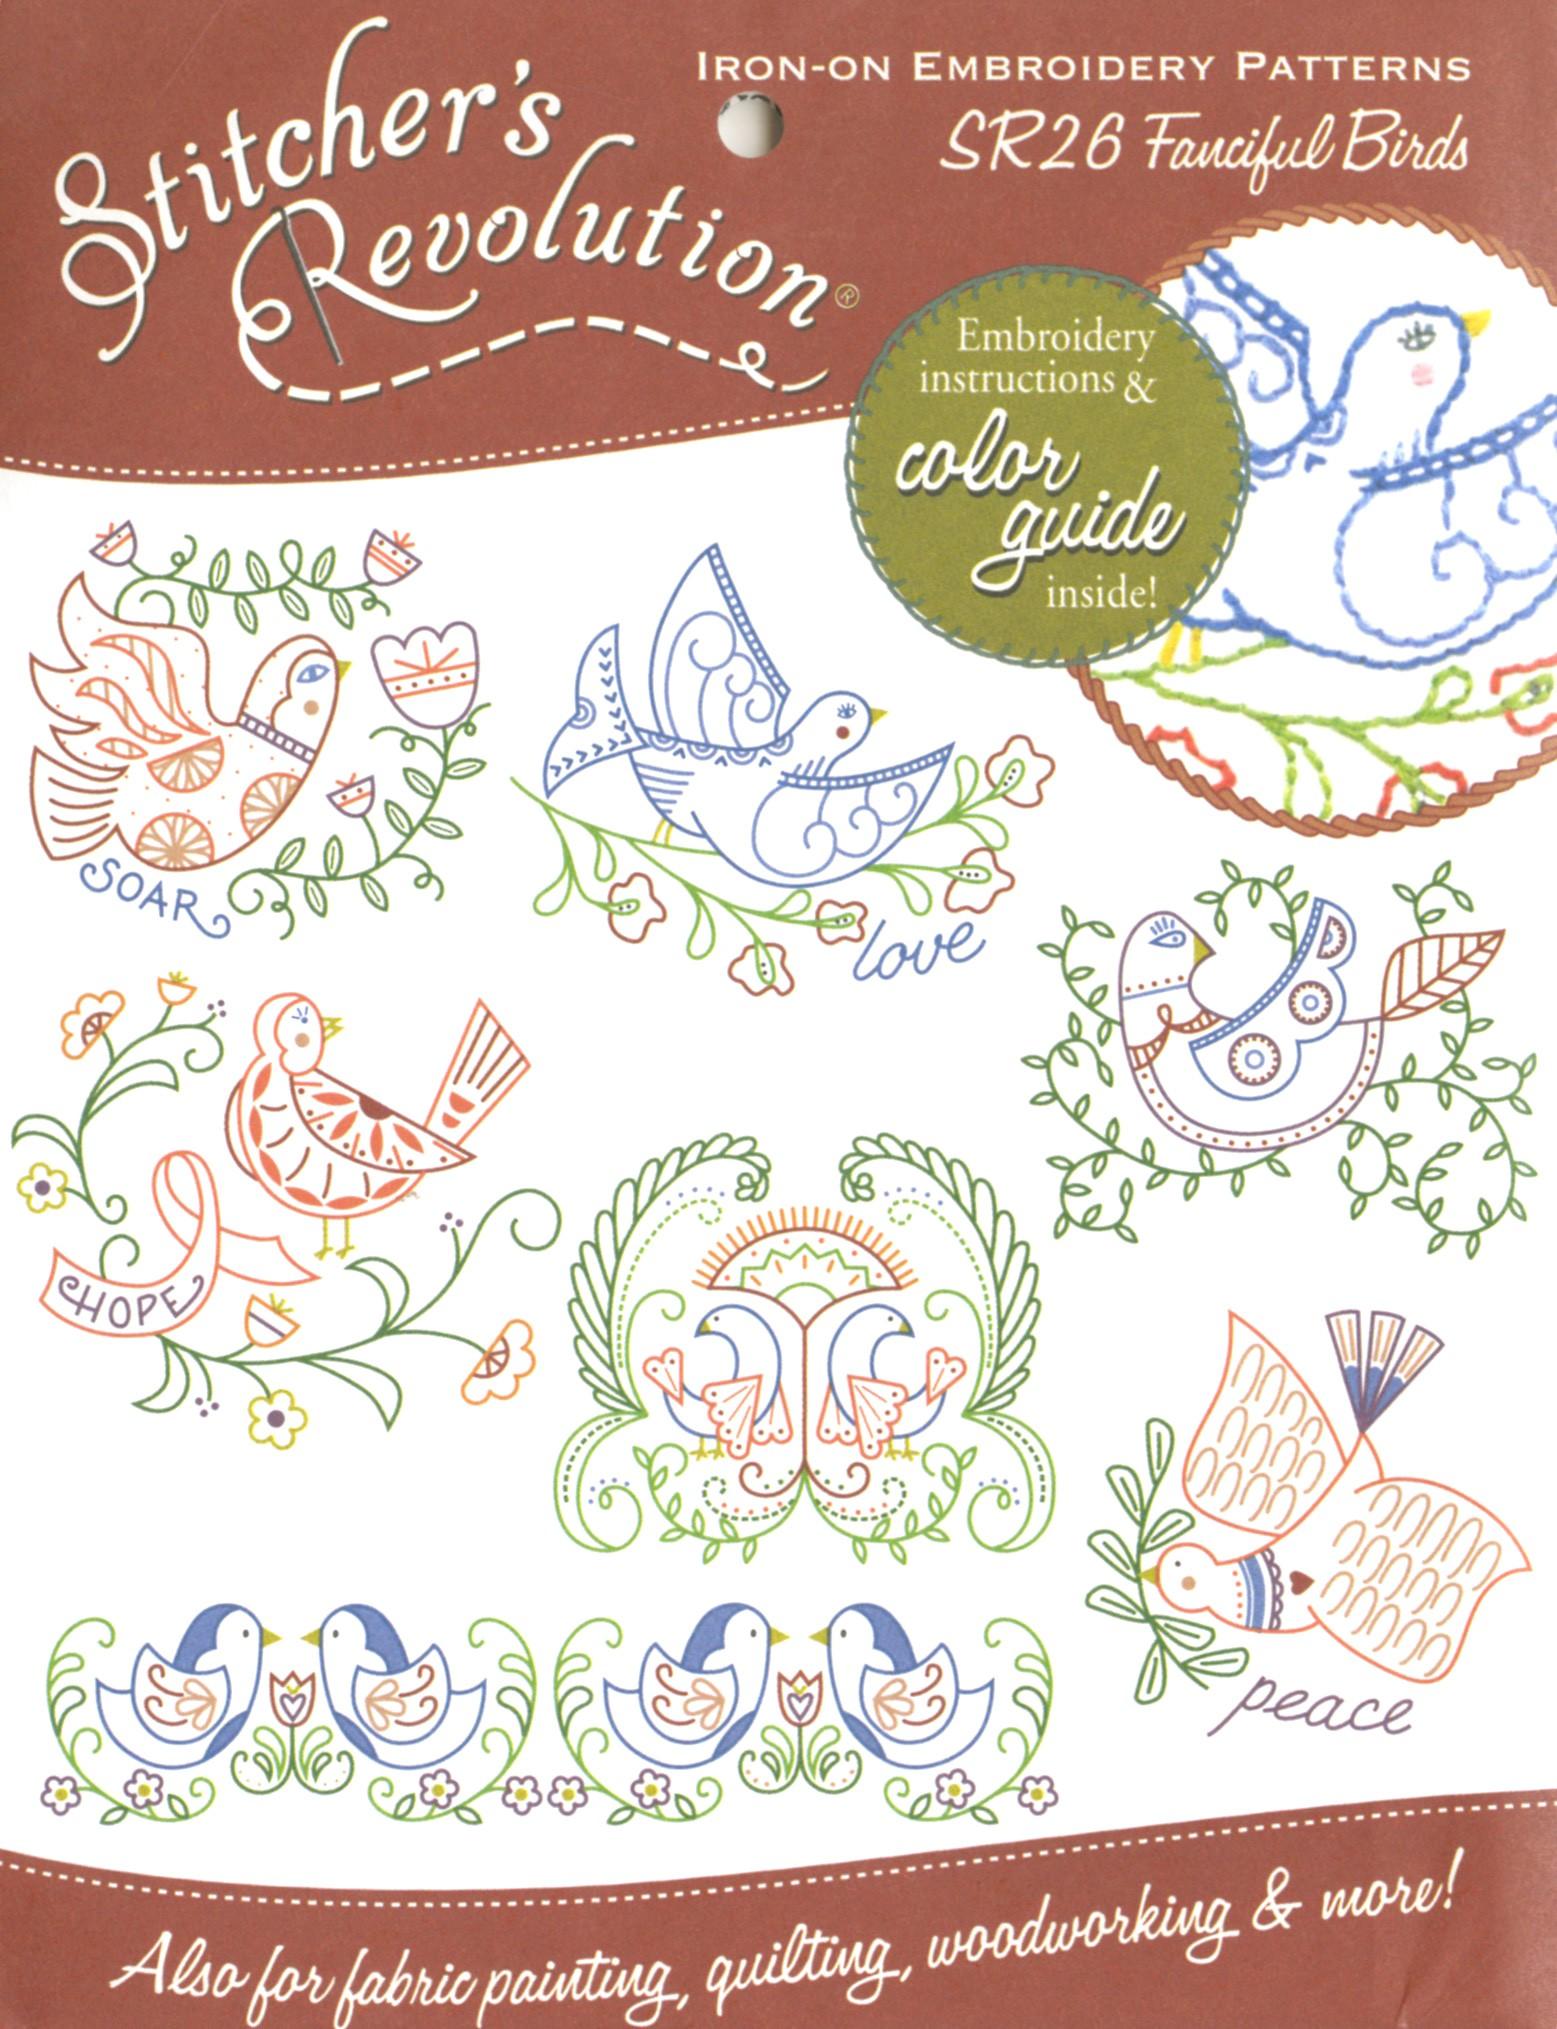 Stitchers Revolution Folksy Farm Iron-On Transfer Pattern for Embroidery